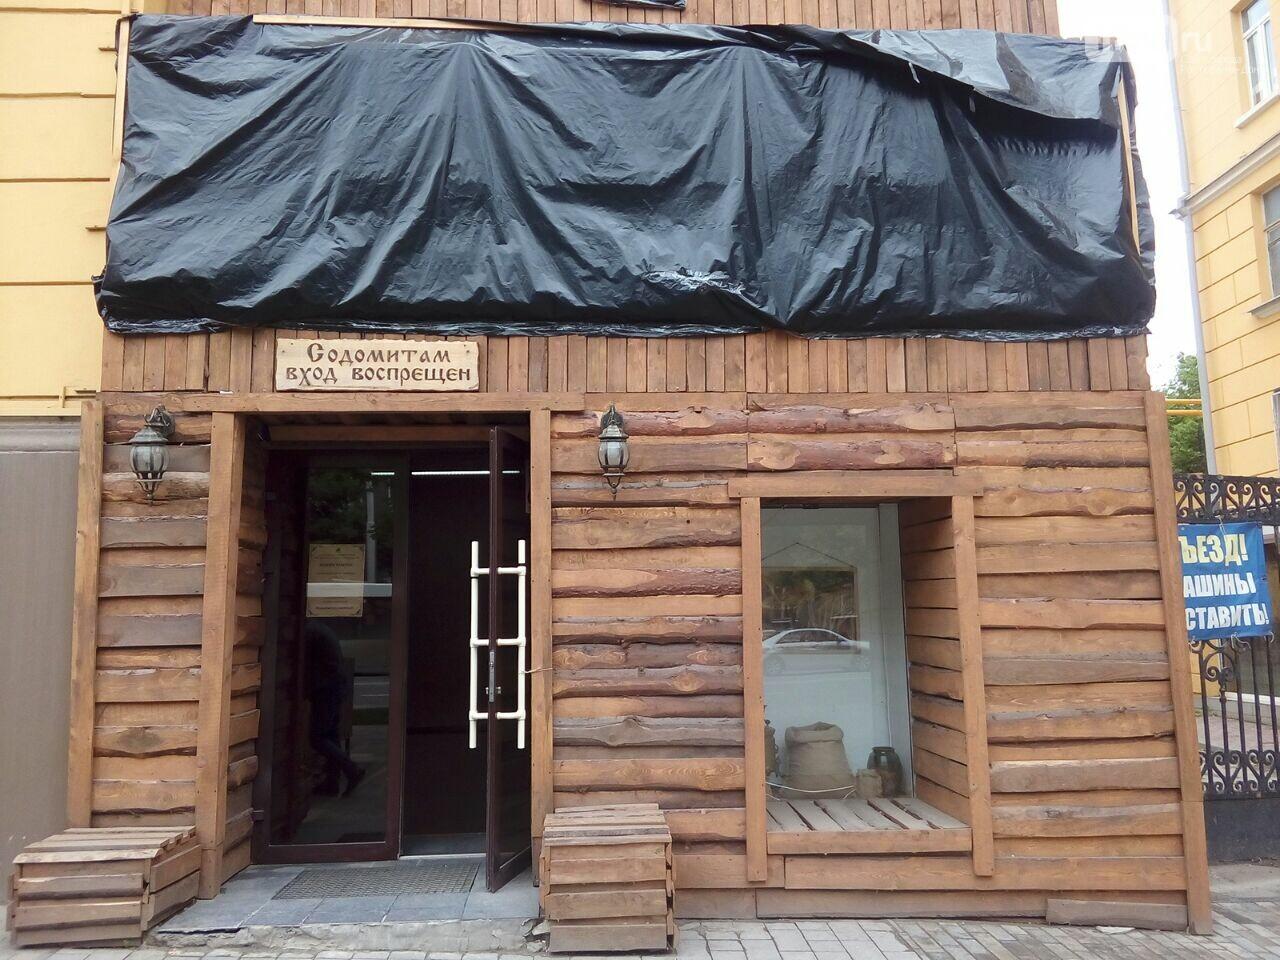 В Ростове лавку Стерлигова закрыли журналисты, фото-1, Фото: Анна Дунаева / 1rnd.ru